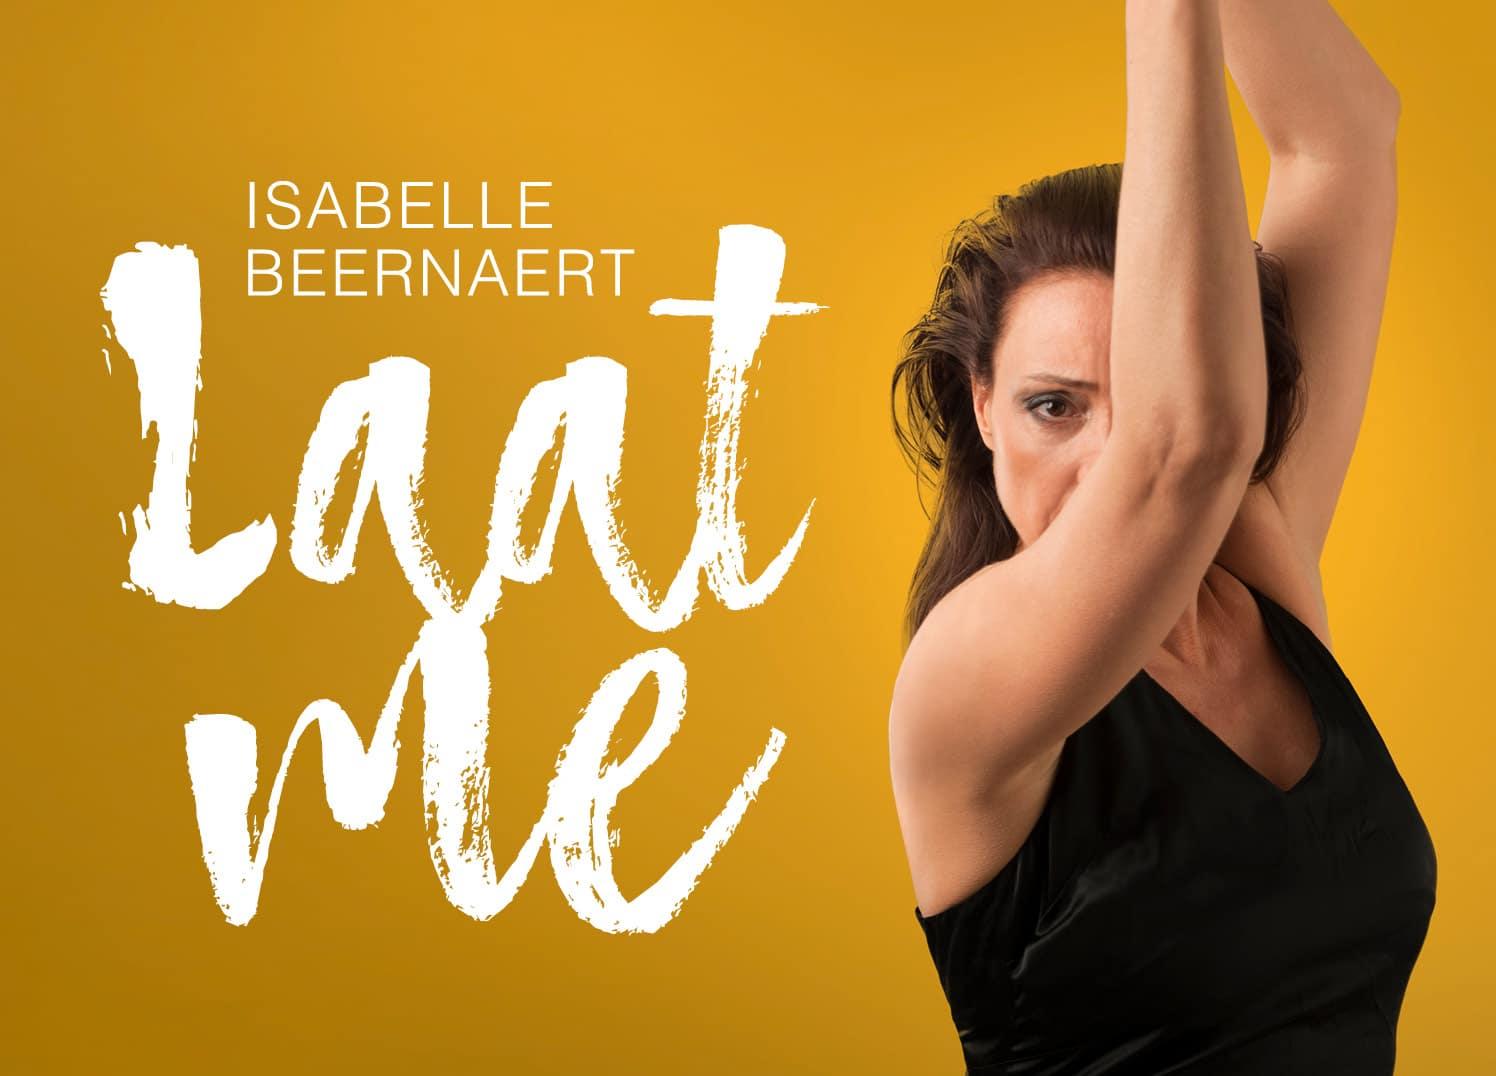 Laat me Isabelle Beernaert